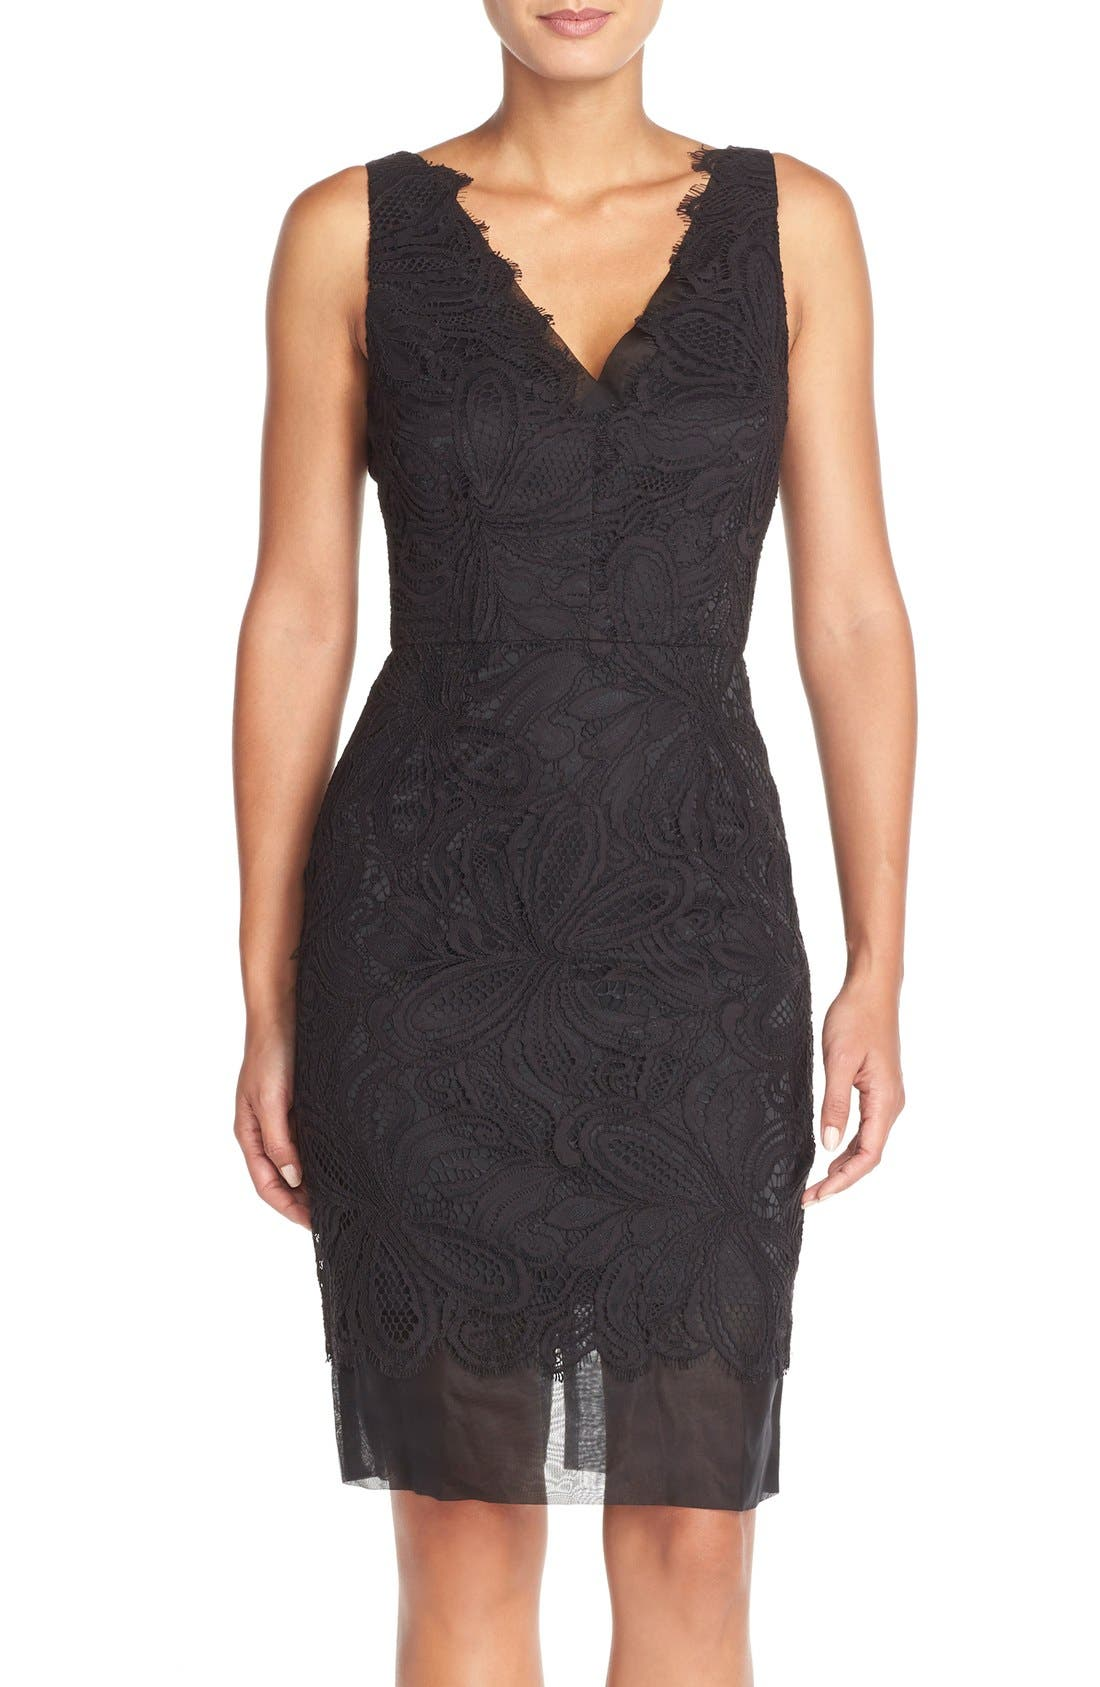 Alternate Image 1 Selected - Trina Turk 'Agni' Lace Sheath Dress